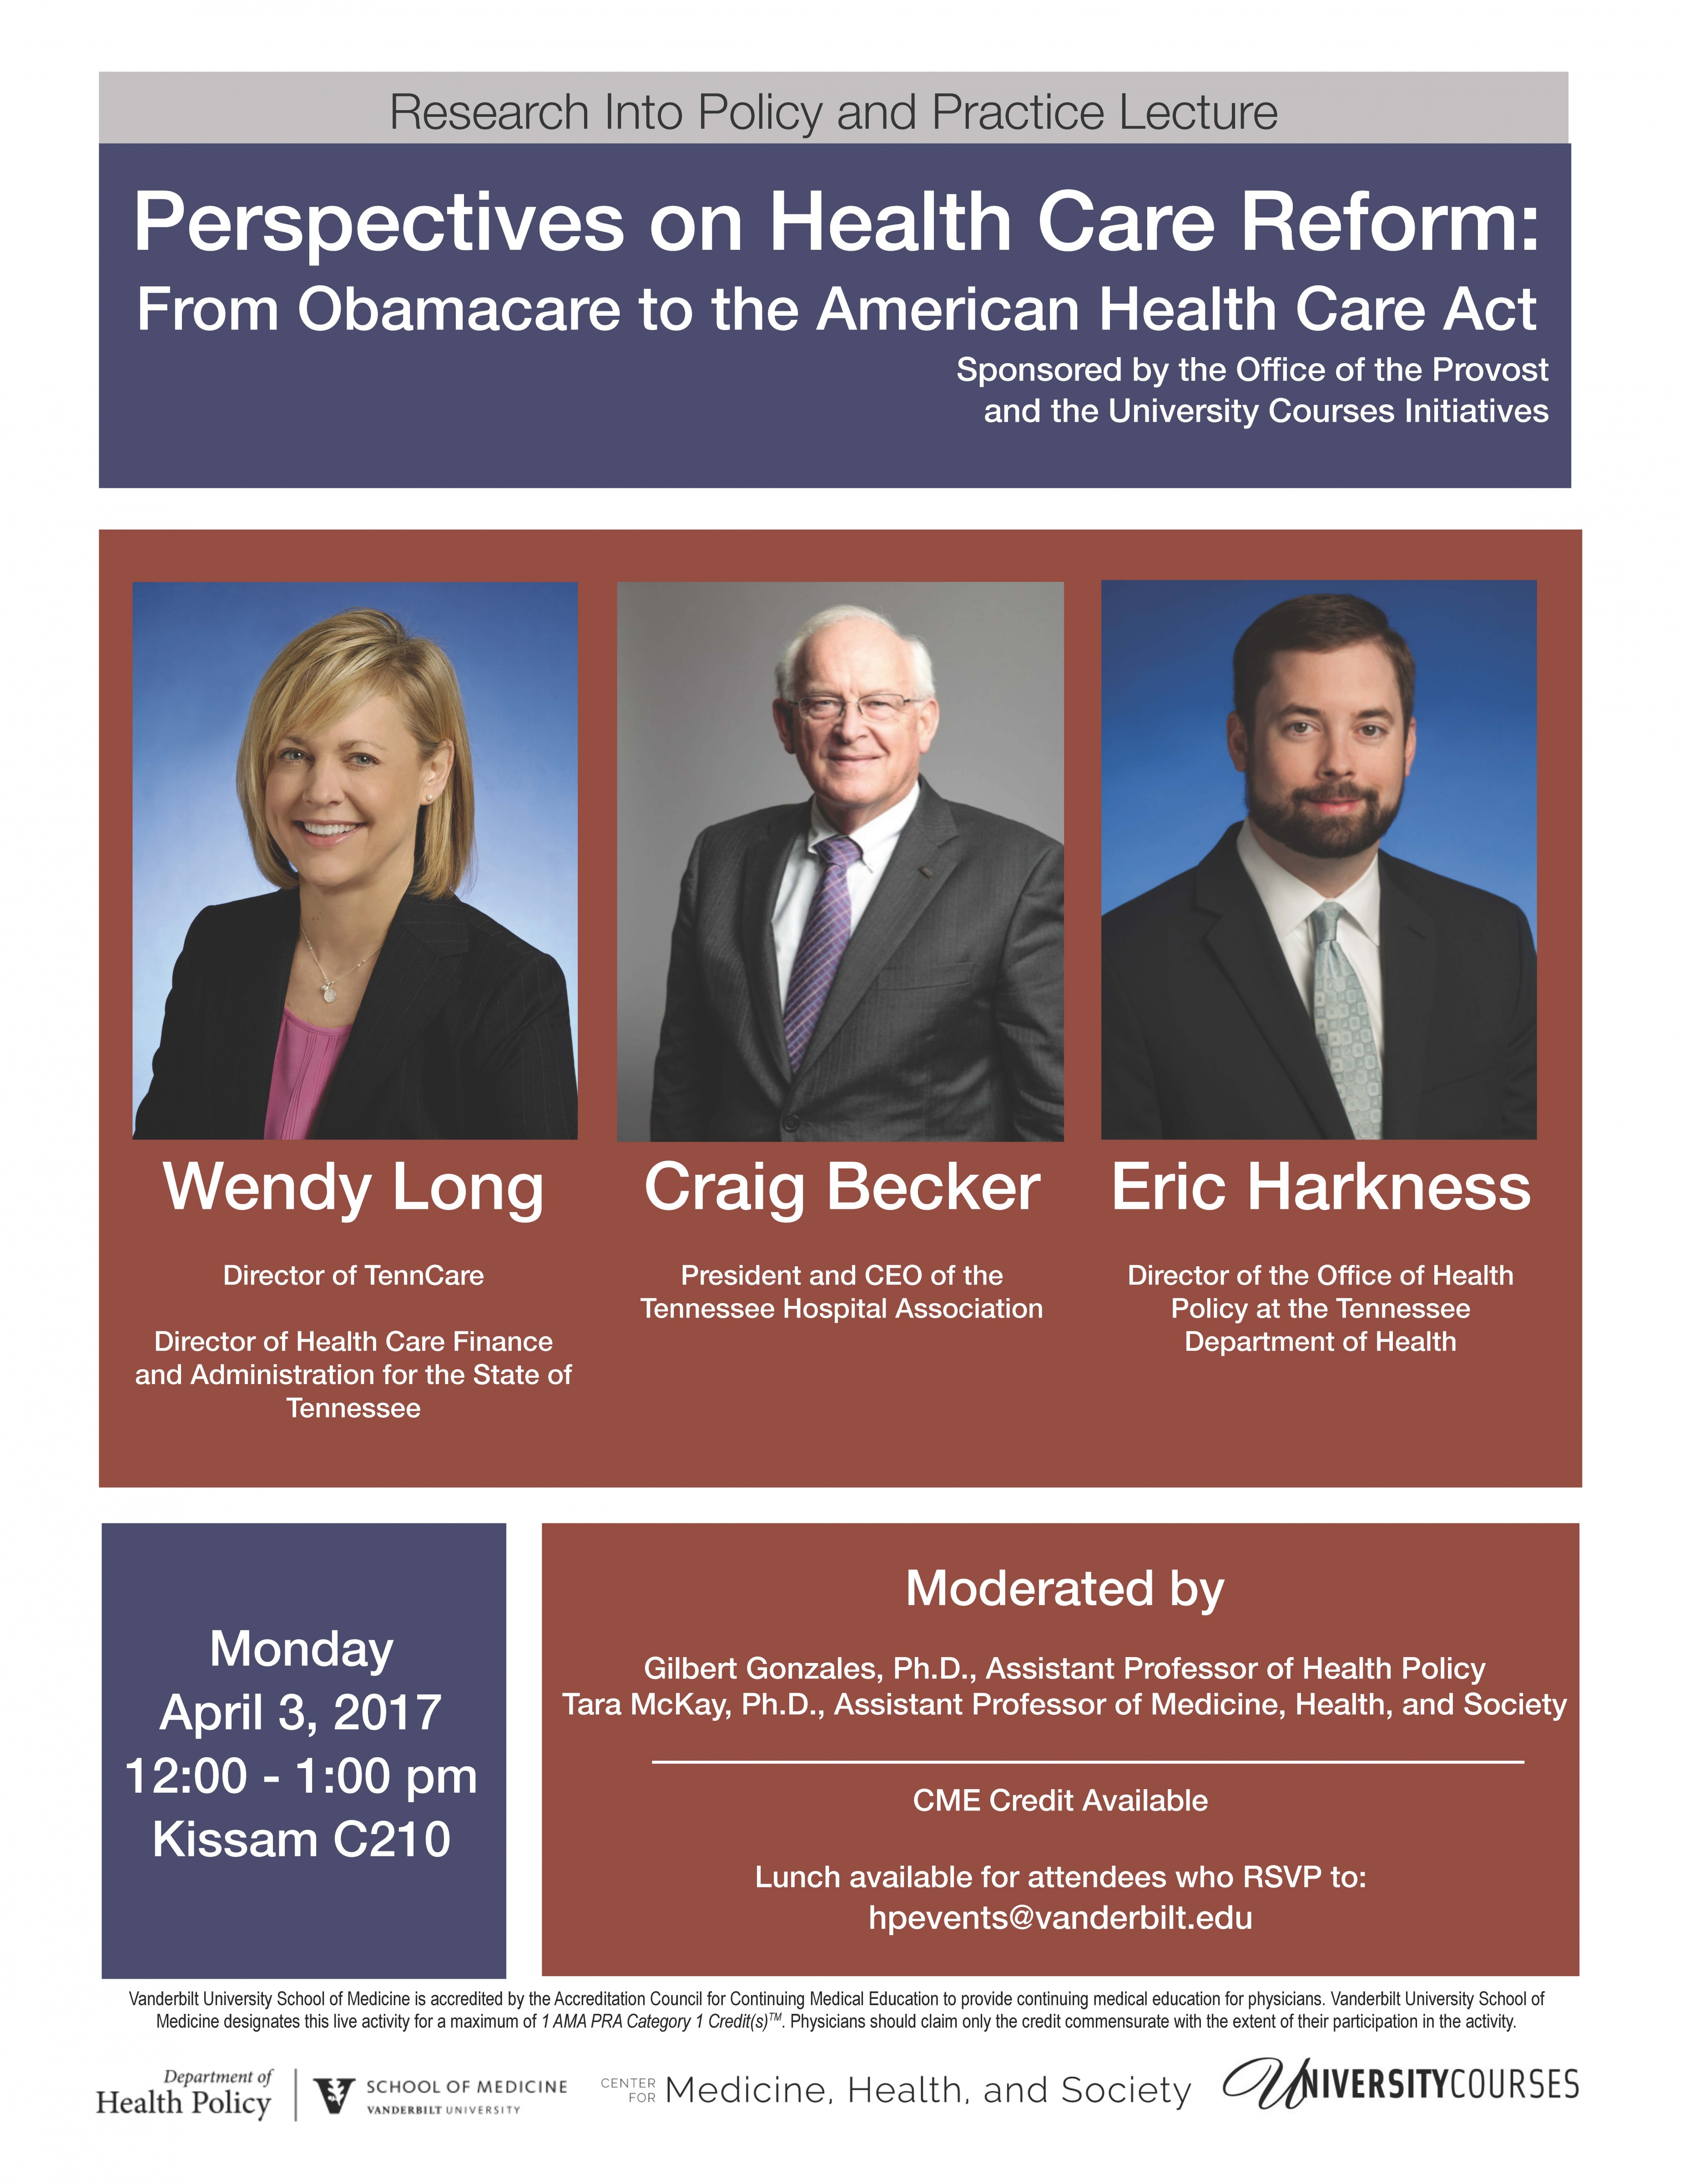 Perspectives on Health Care Reform_RIPPL[2].jpg